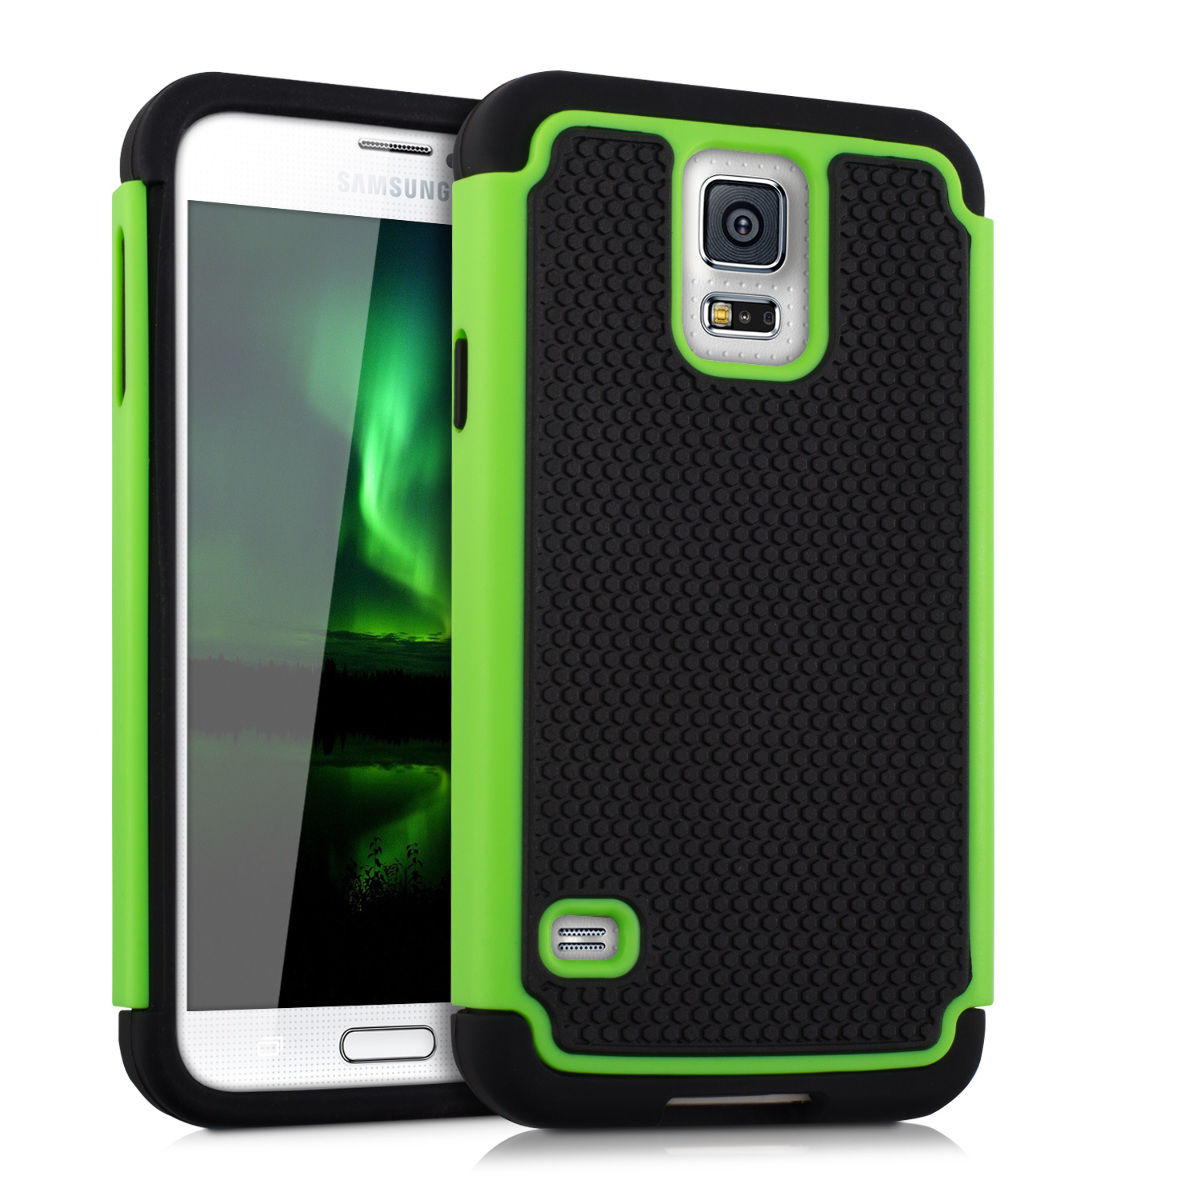 Odolné pouzdro pro Samsung Galaxy S5 / Neo zelené